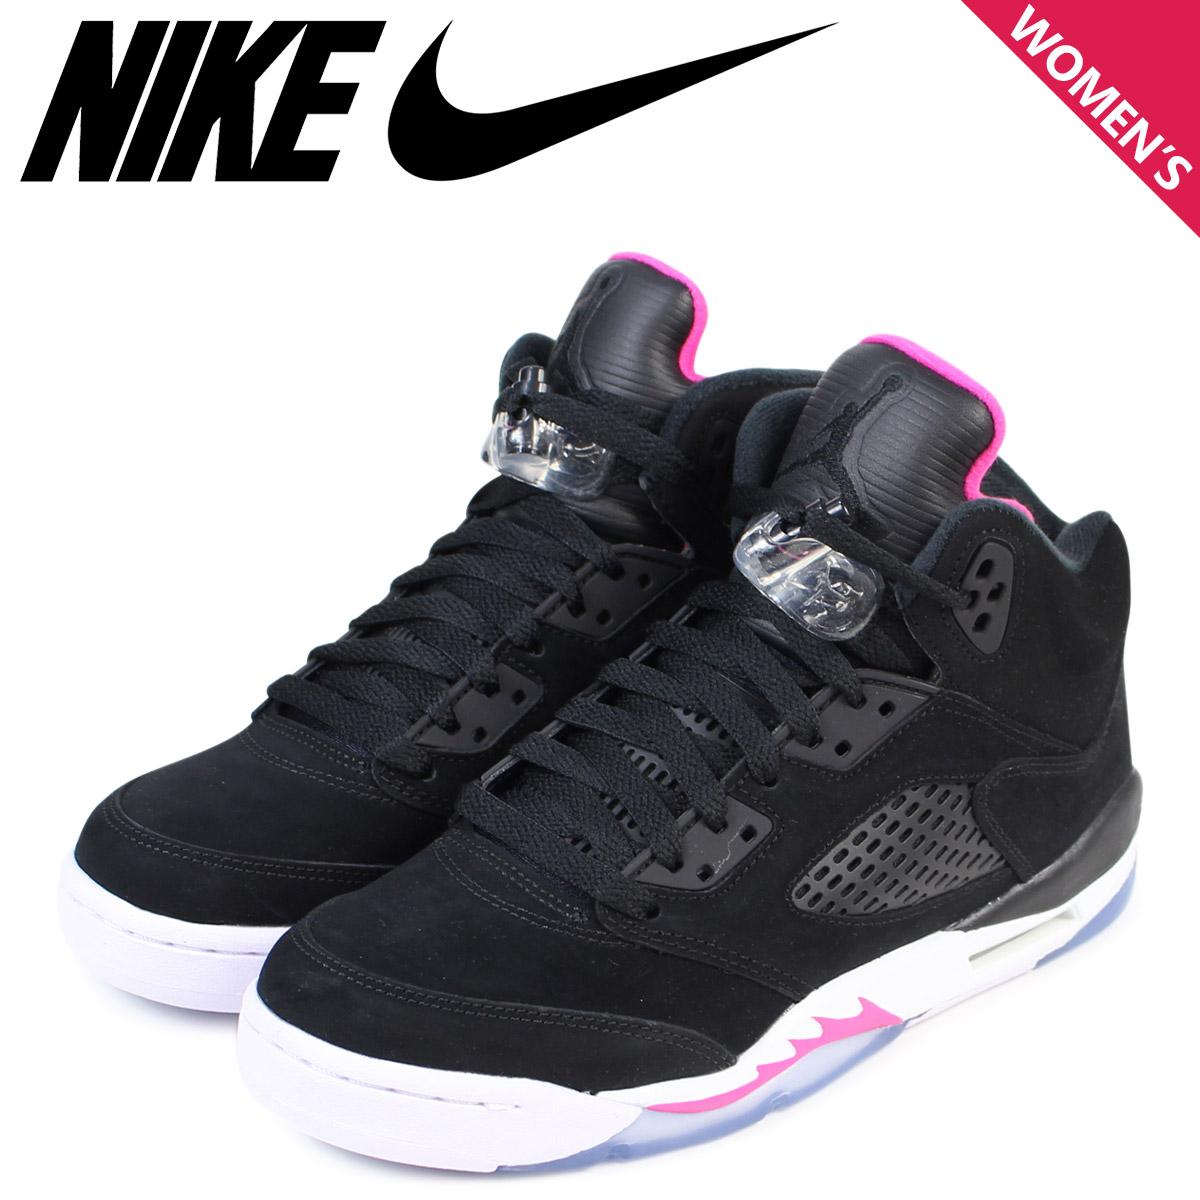 info for cd1e6 01dd2 NIKE Nike Air Jordan 5 nostalgic lady s sneakers AIR JORDAN 5 RETRO GG  440,892-029 ...